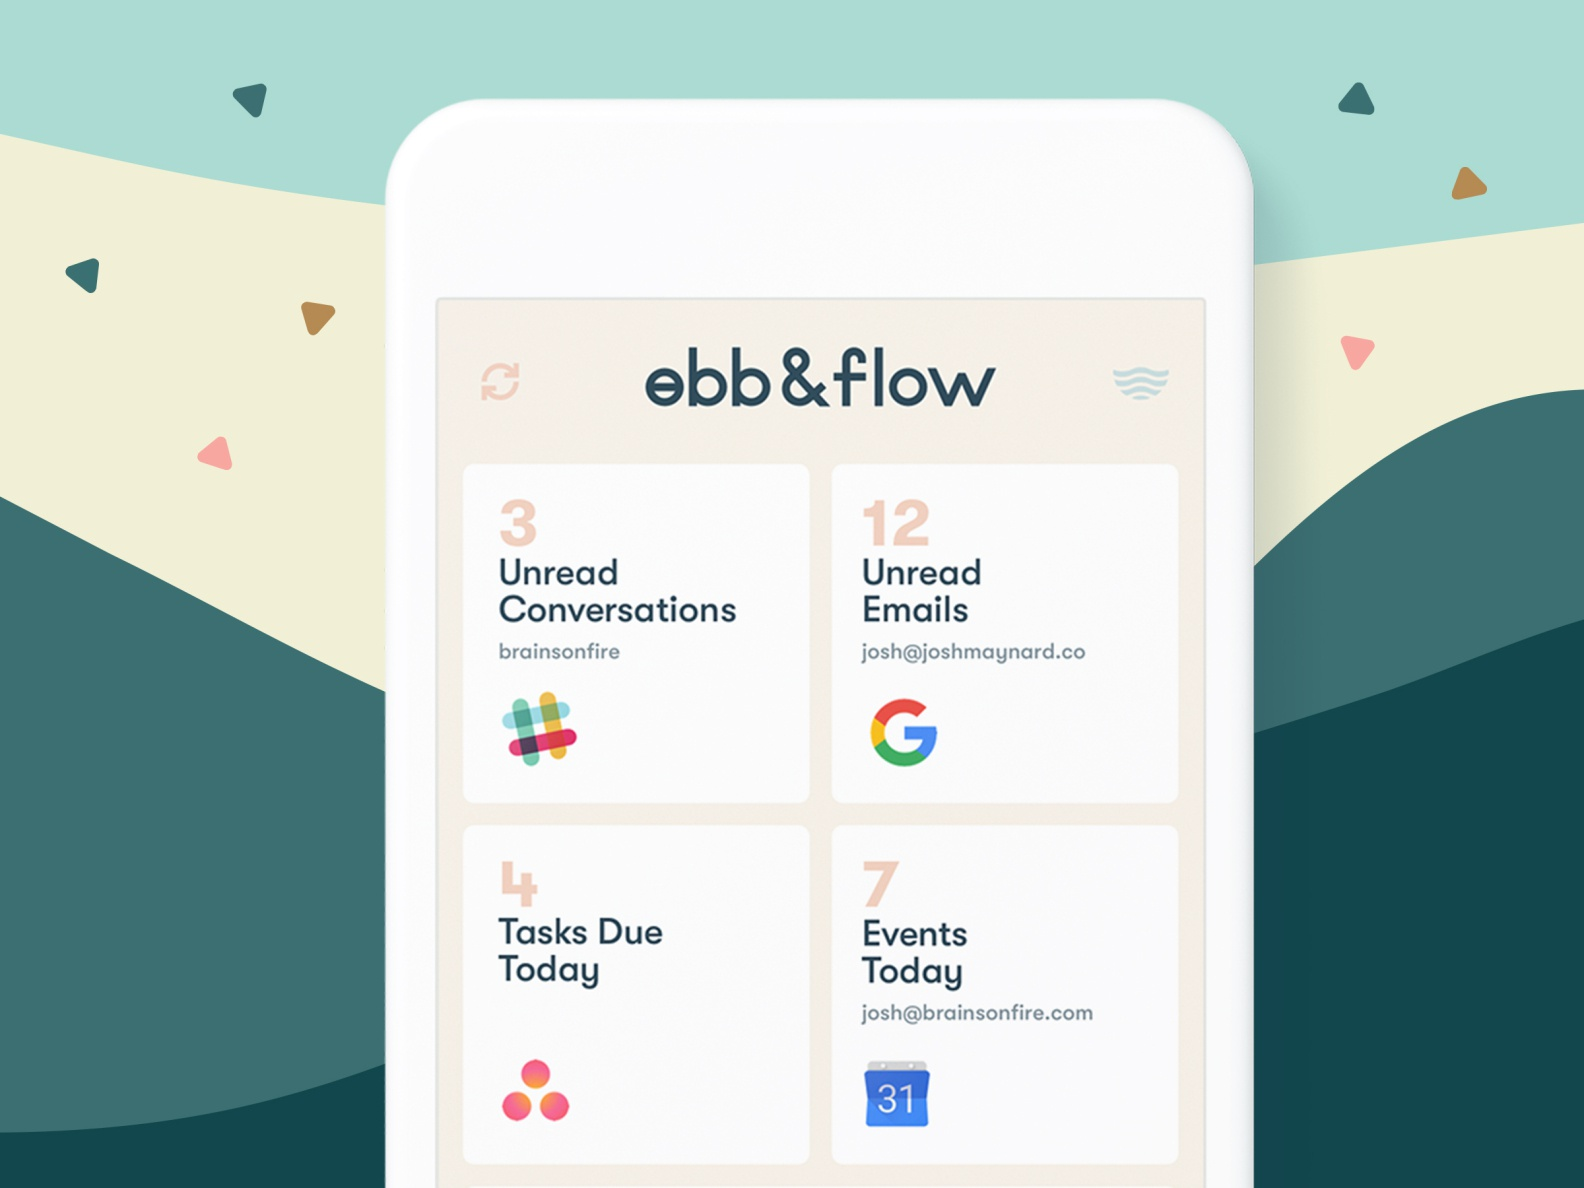 Ebb & Flow - A UX Case Study